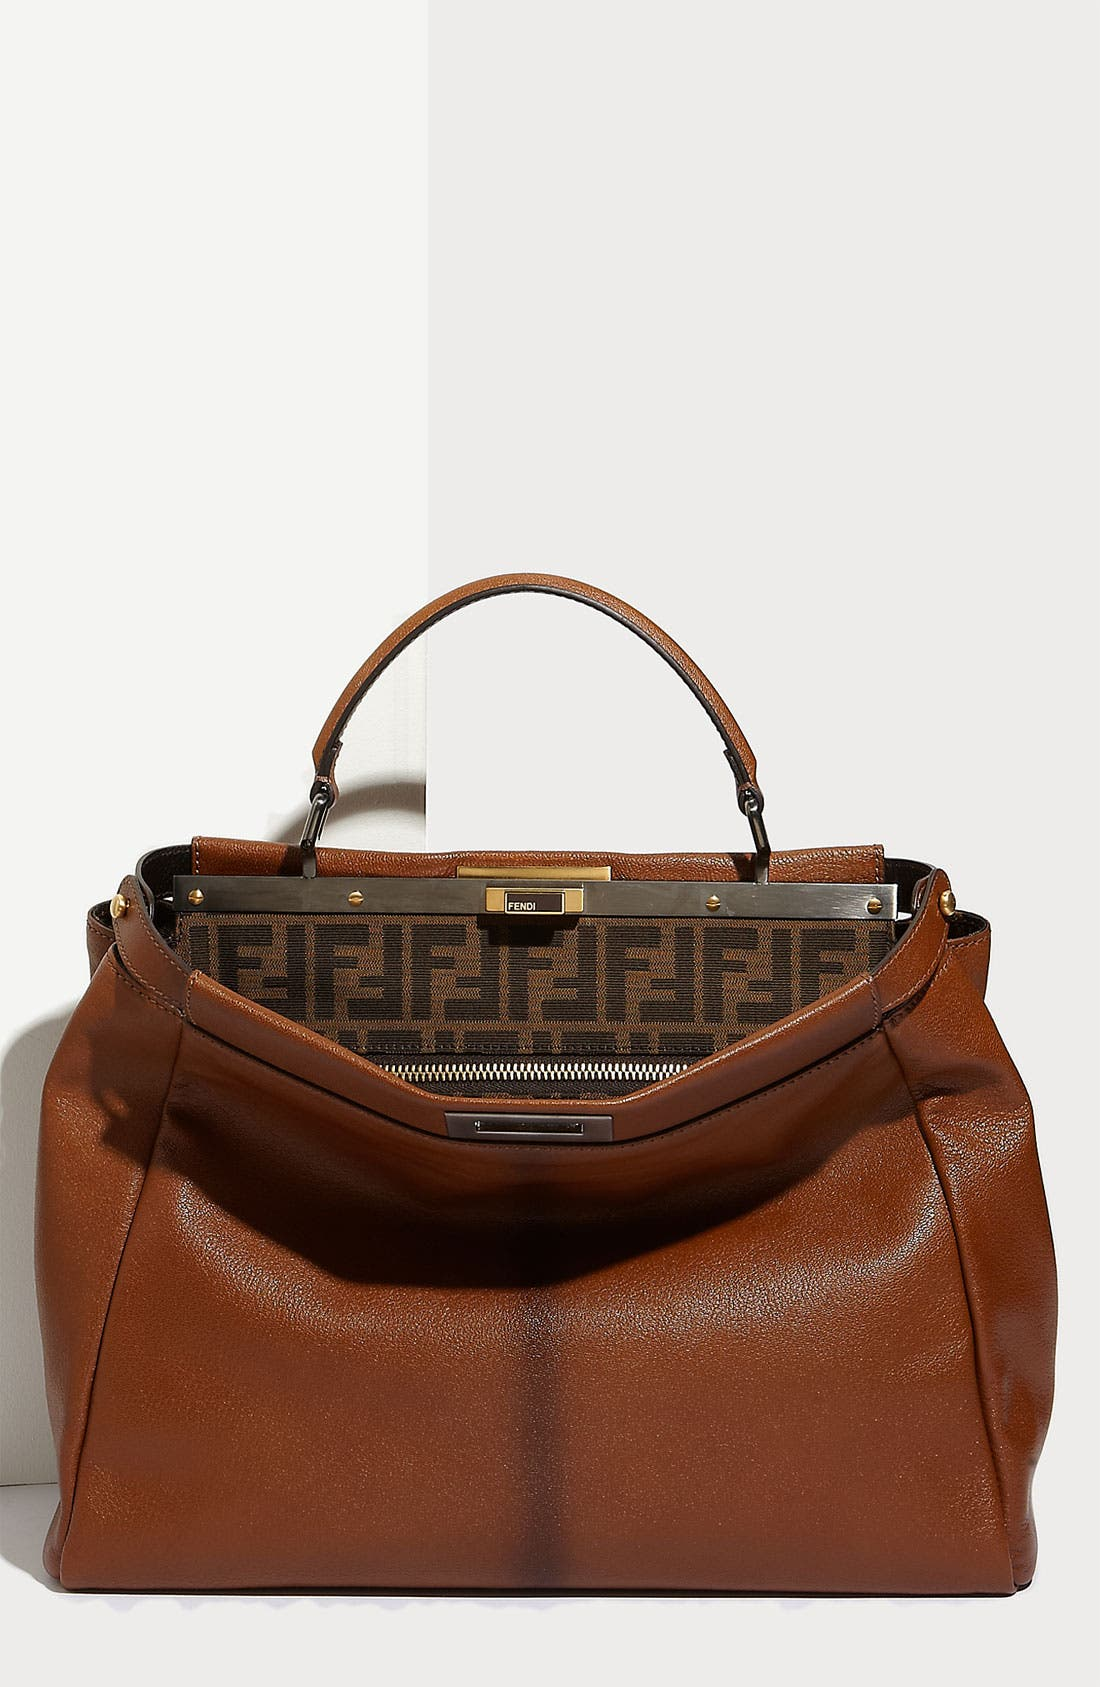 Alternate Image 1 Selected - Fendi 'Peekaboo - Large' Goatskin Leather Satchel